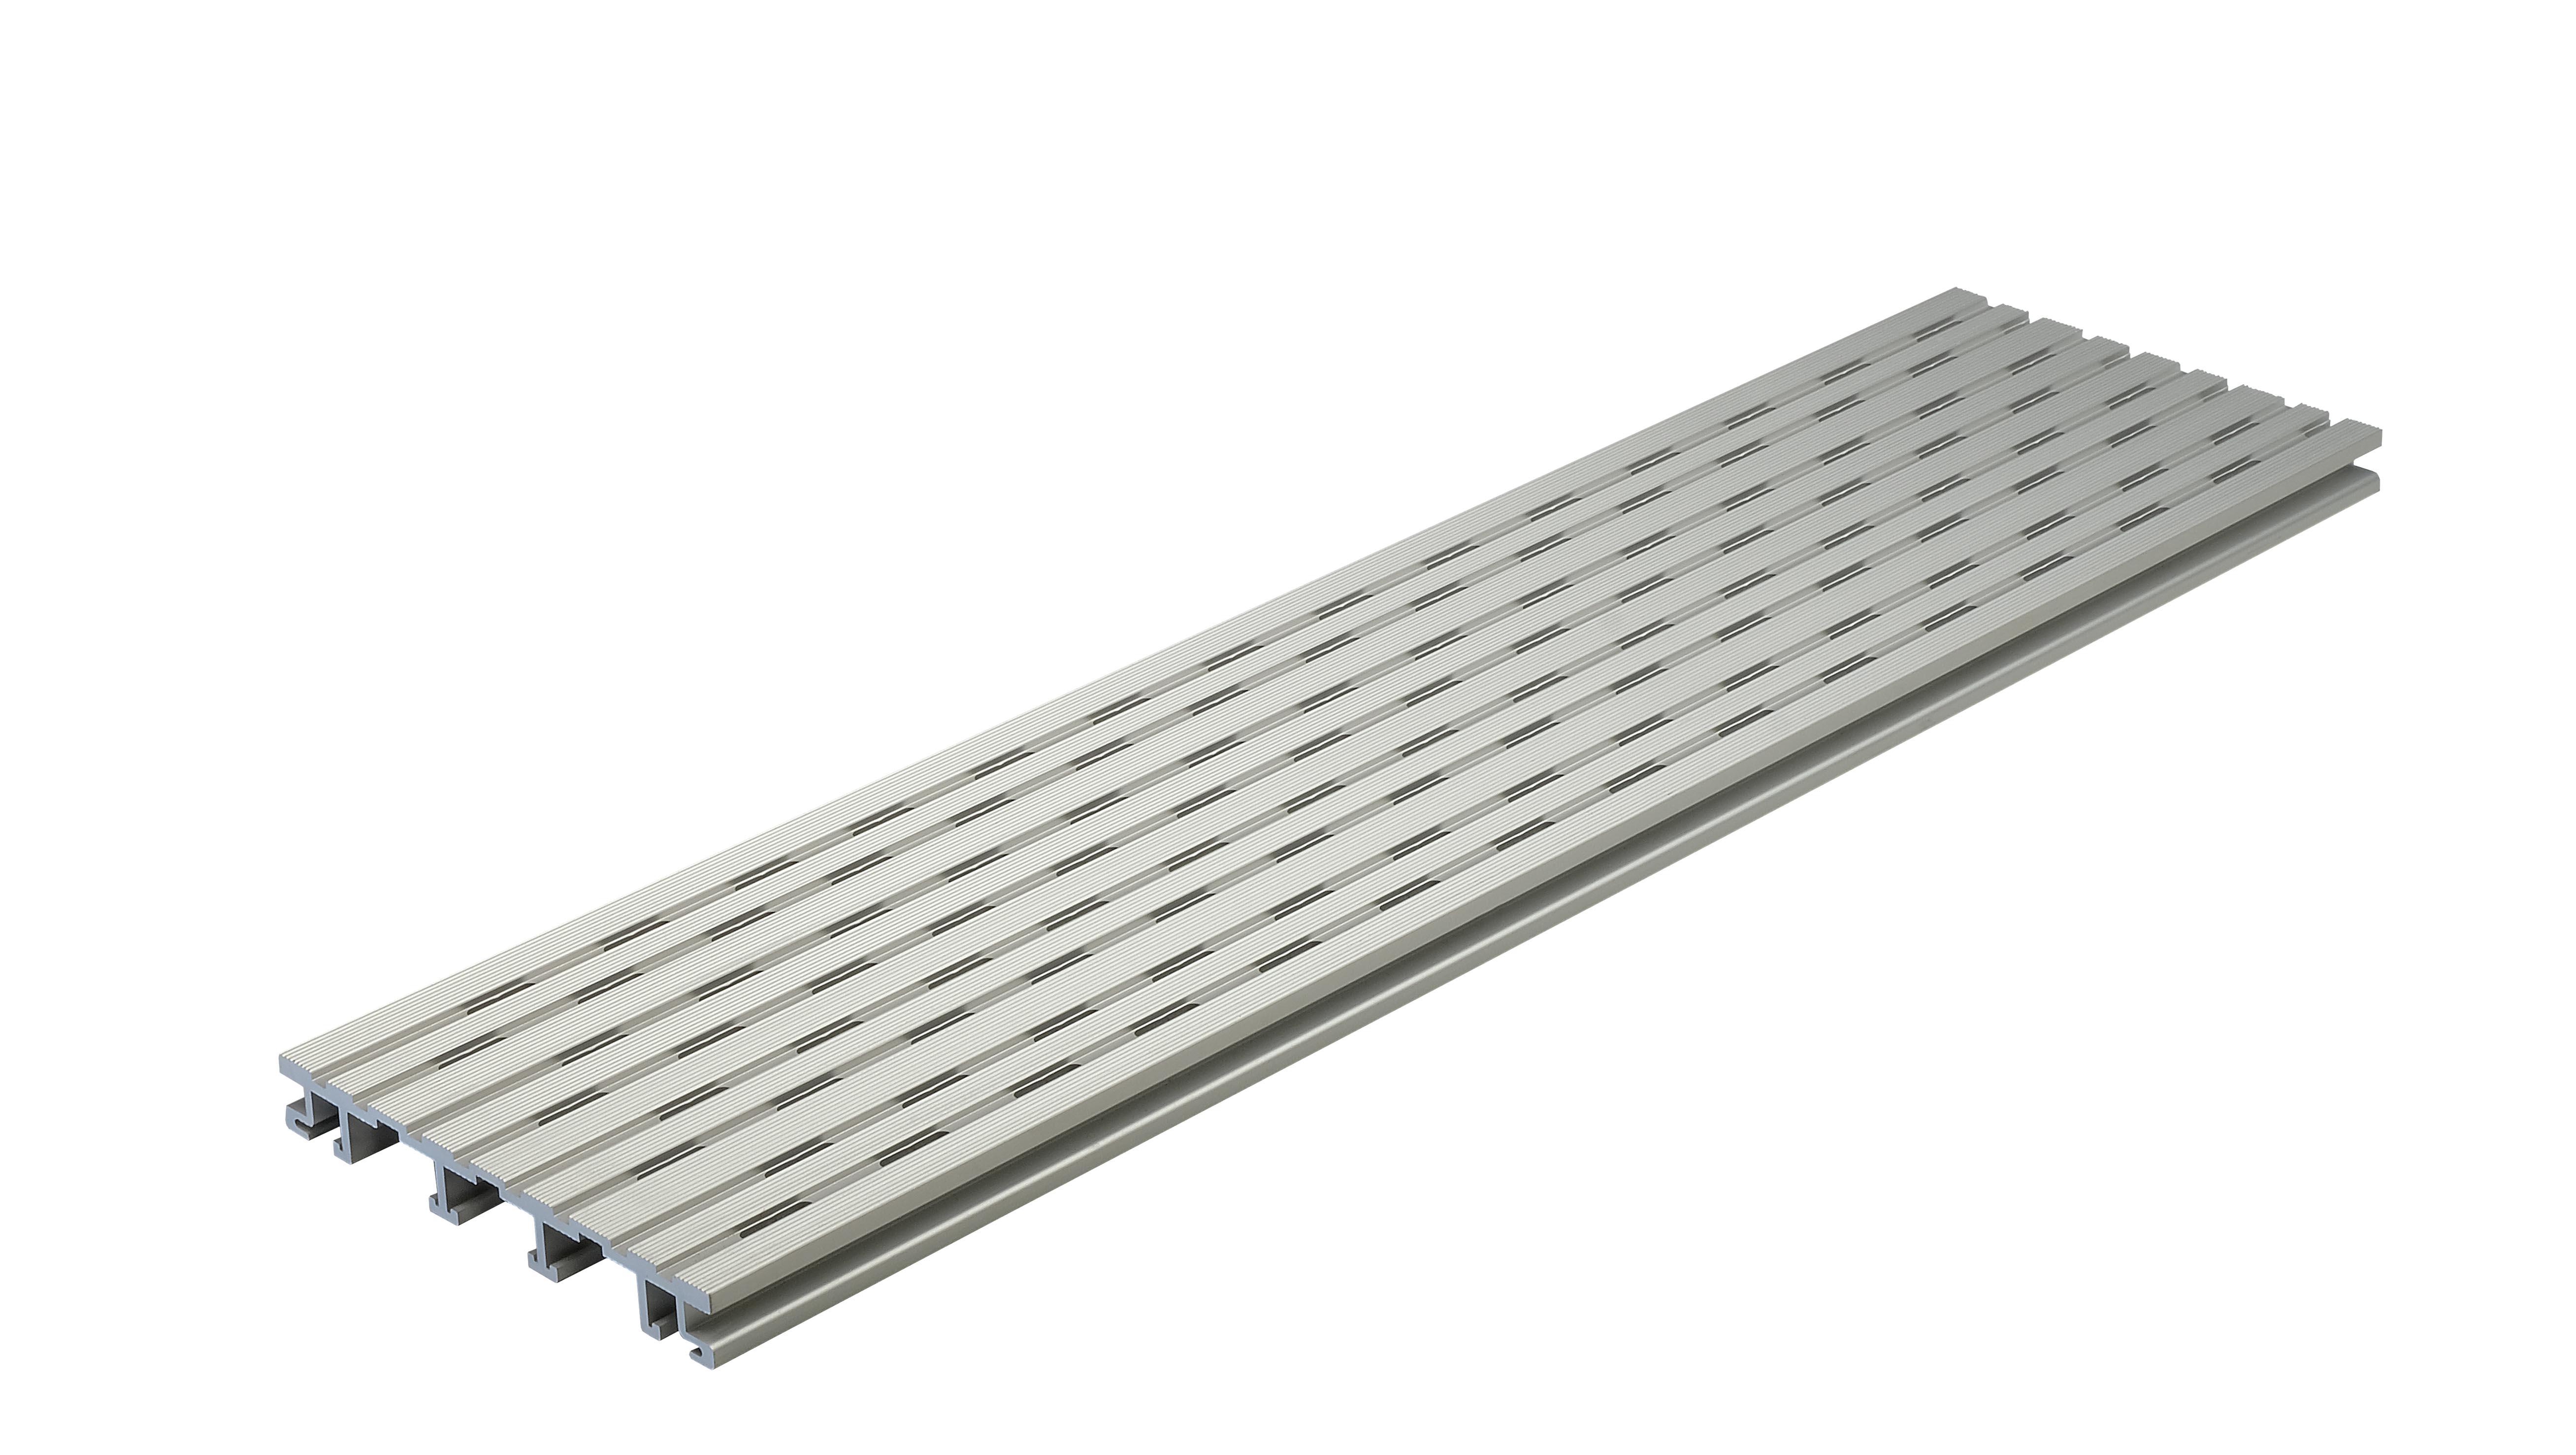 Kovalex Belüftungs-/Entwässerungsprofil Aluminium für 20 mm WPC-Dielen - 20x150x1000 mm - Aluminium Silber